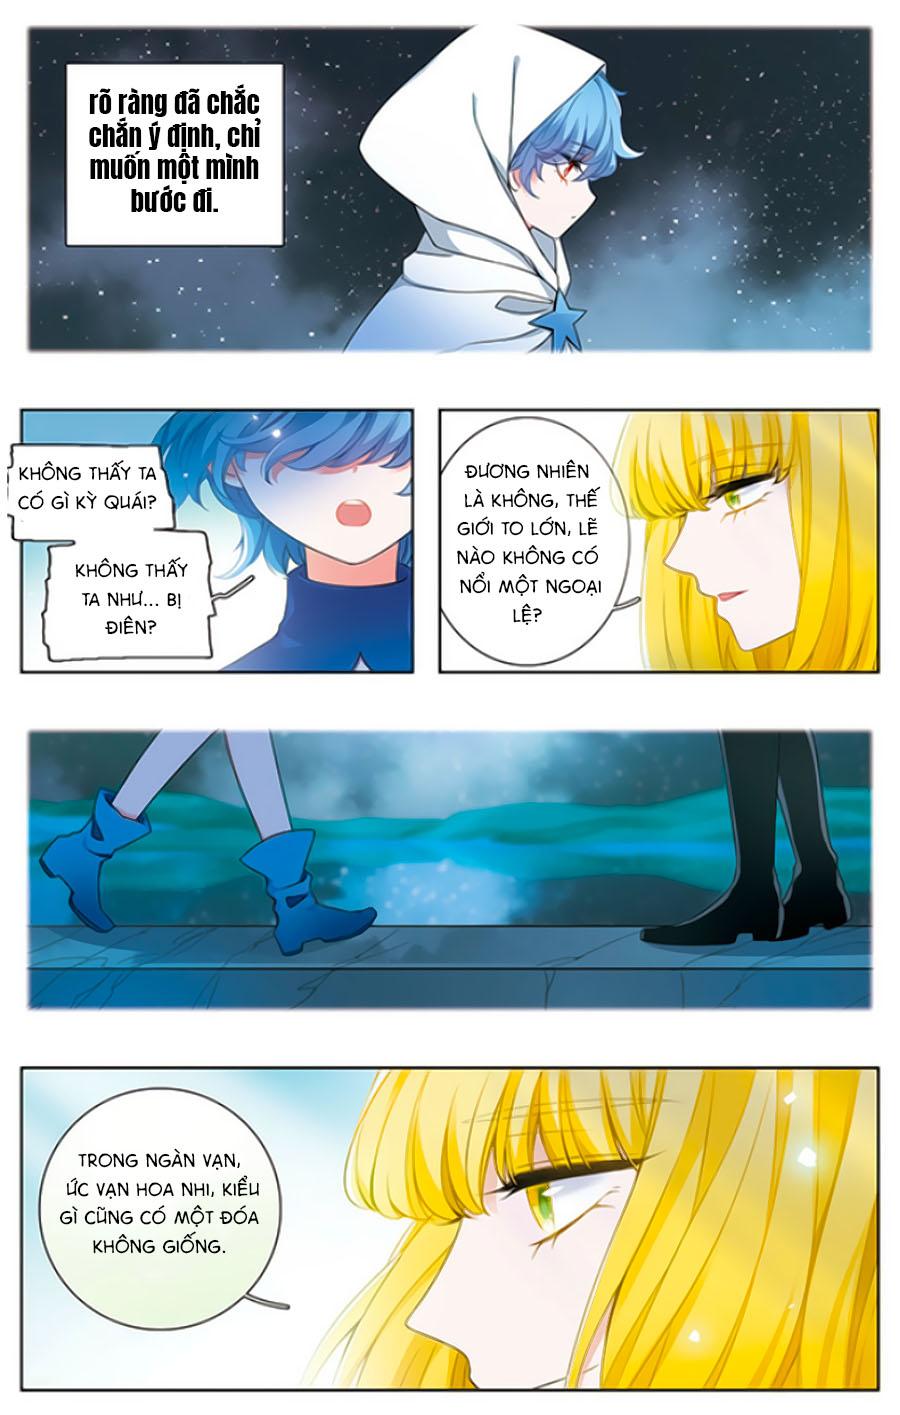 Tinh Linh Tố Chap 13 - Trang 8